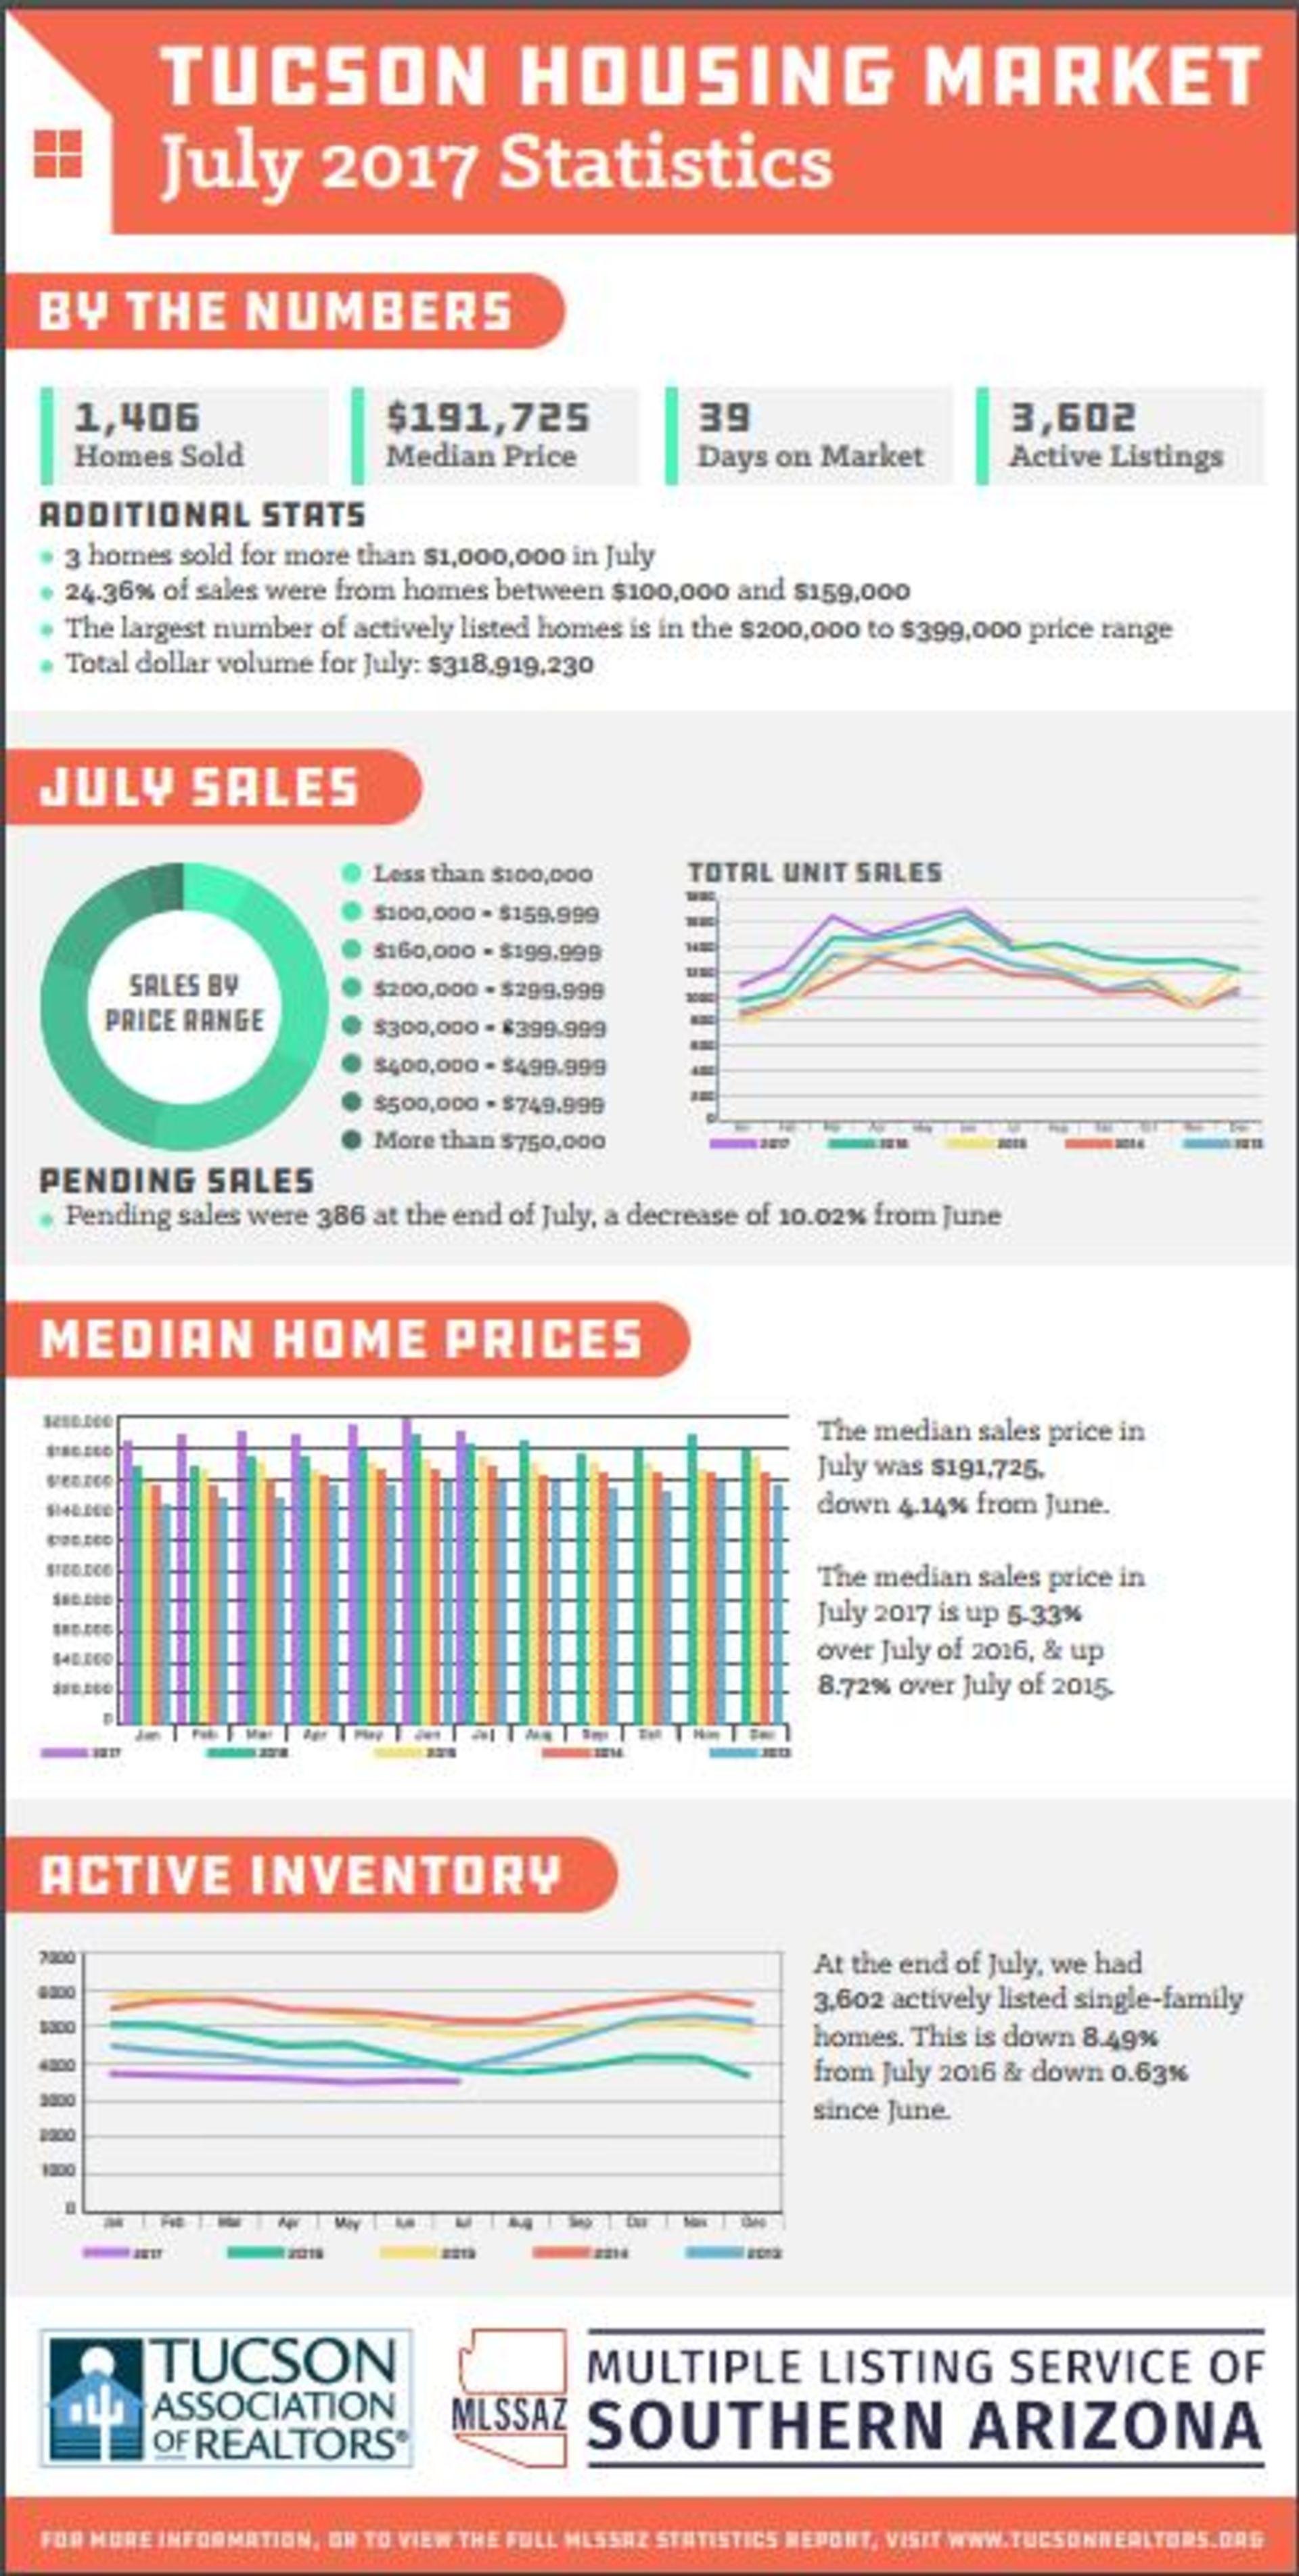 July 2017 Statistics